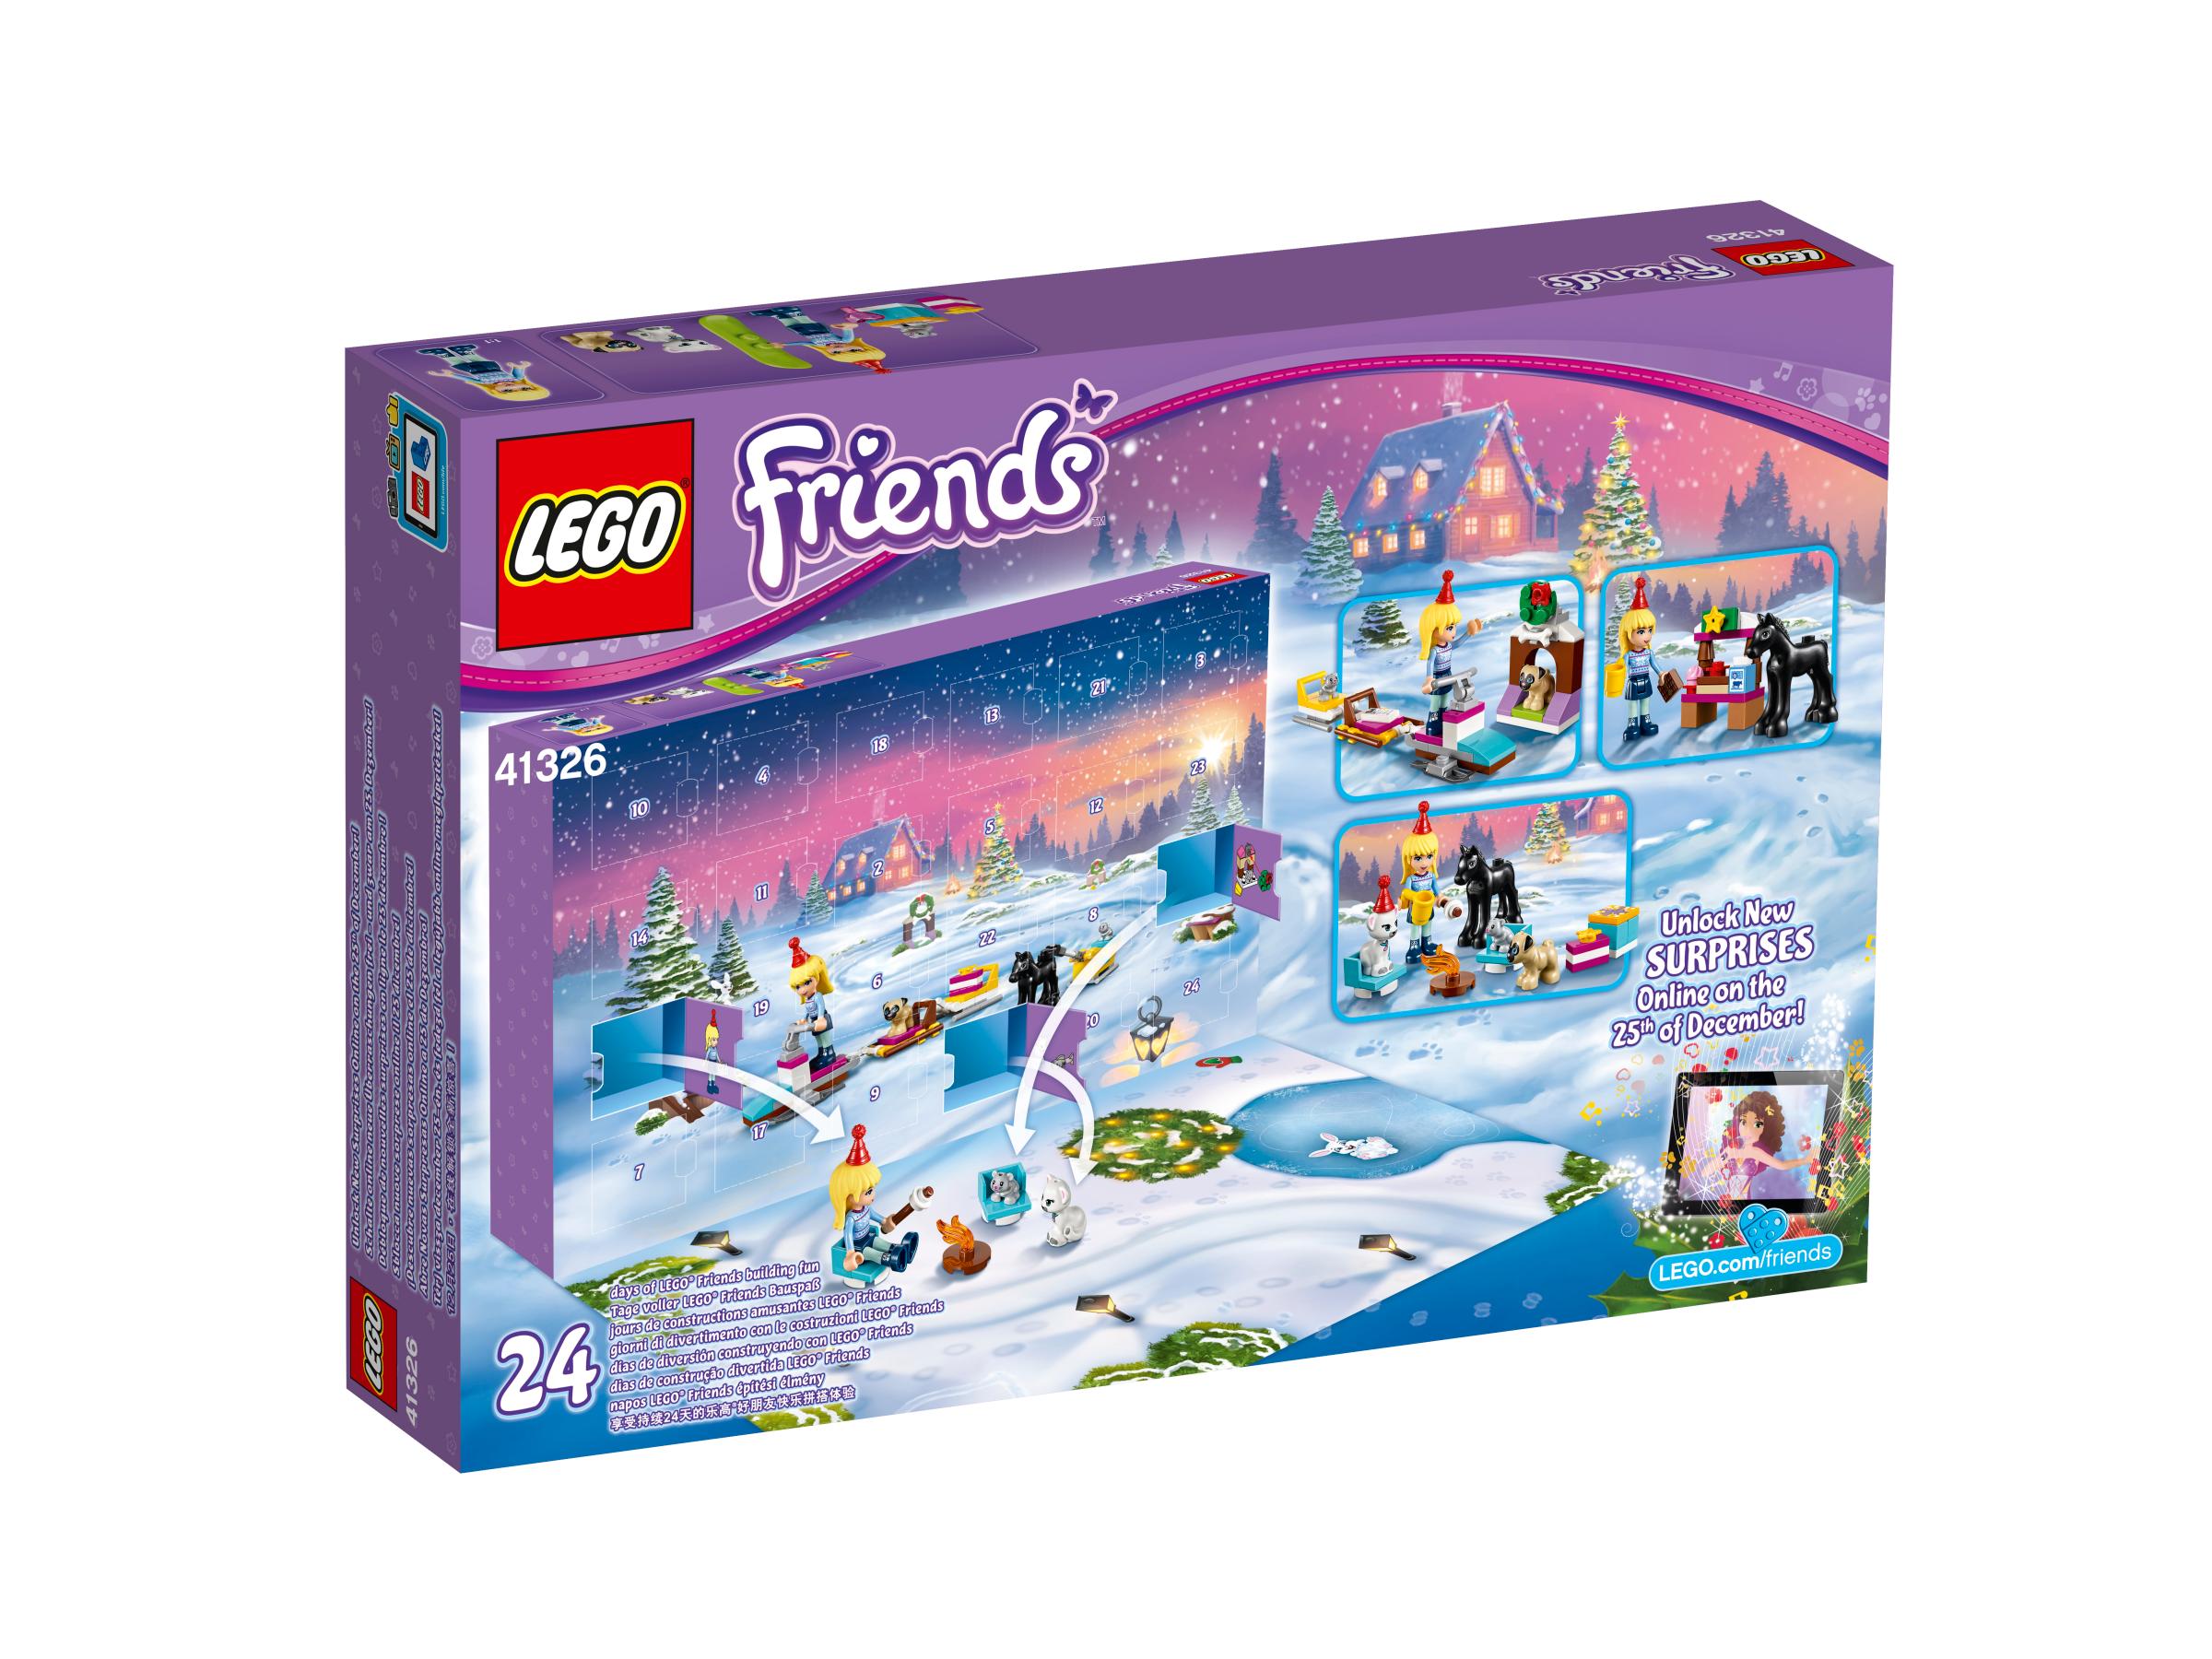 adventni kalendar lego friends LEGO Friends Adventní kalendář 41326 | KostičkyLega.cz adventni kalendar lego friends